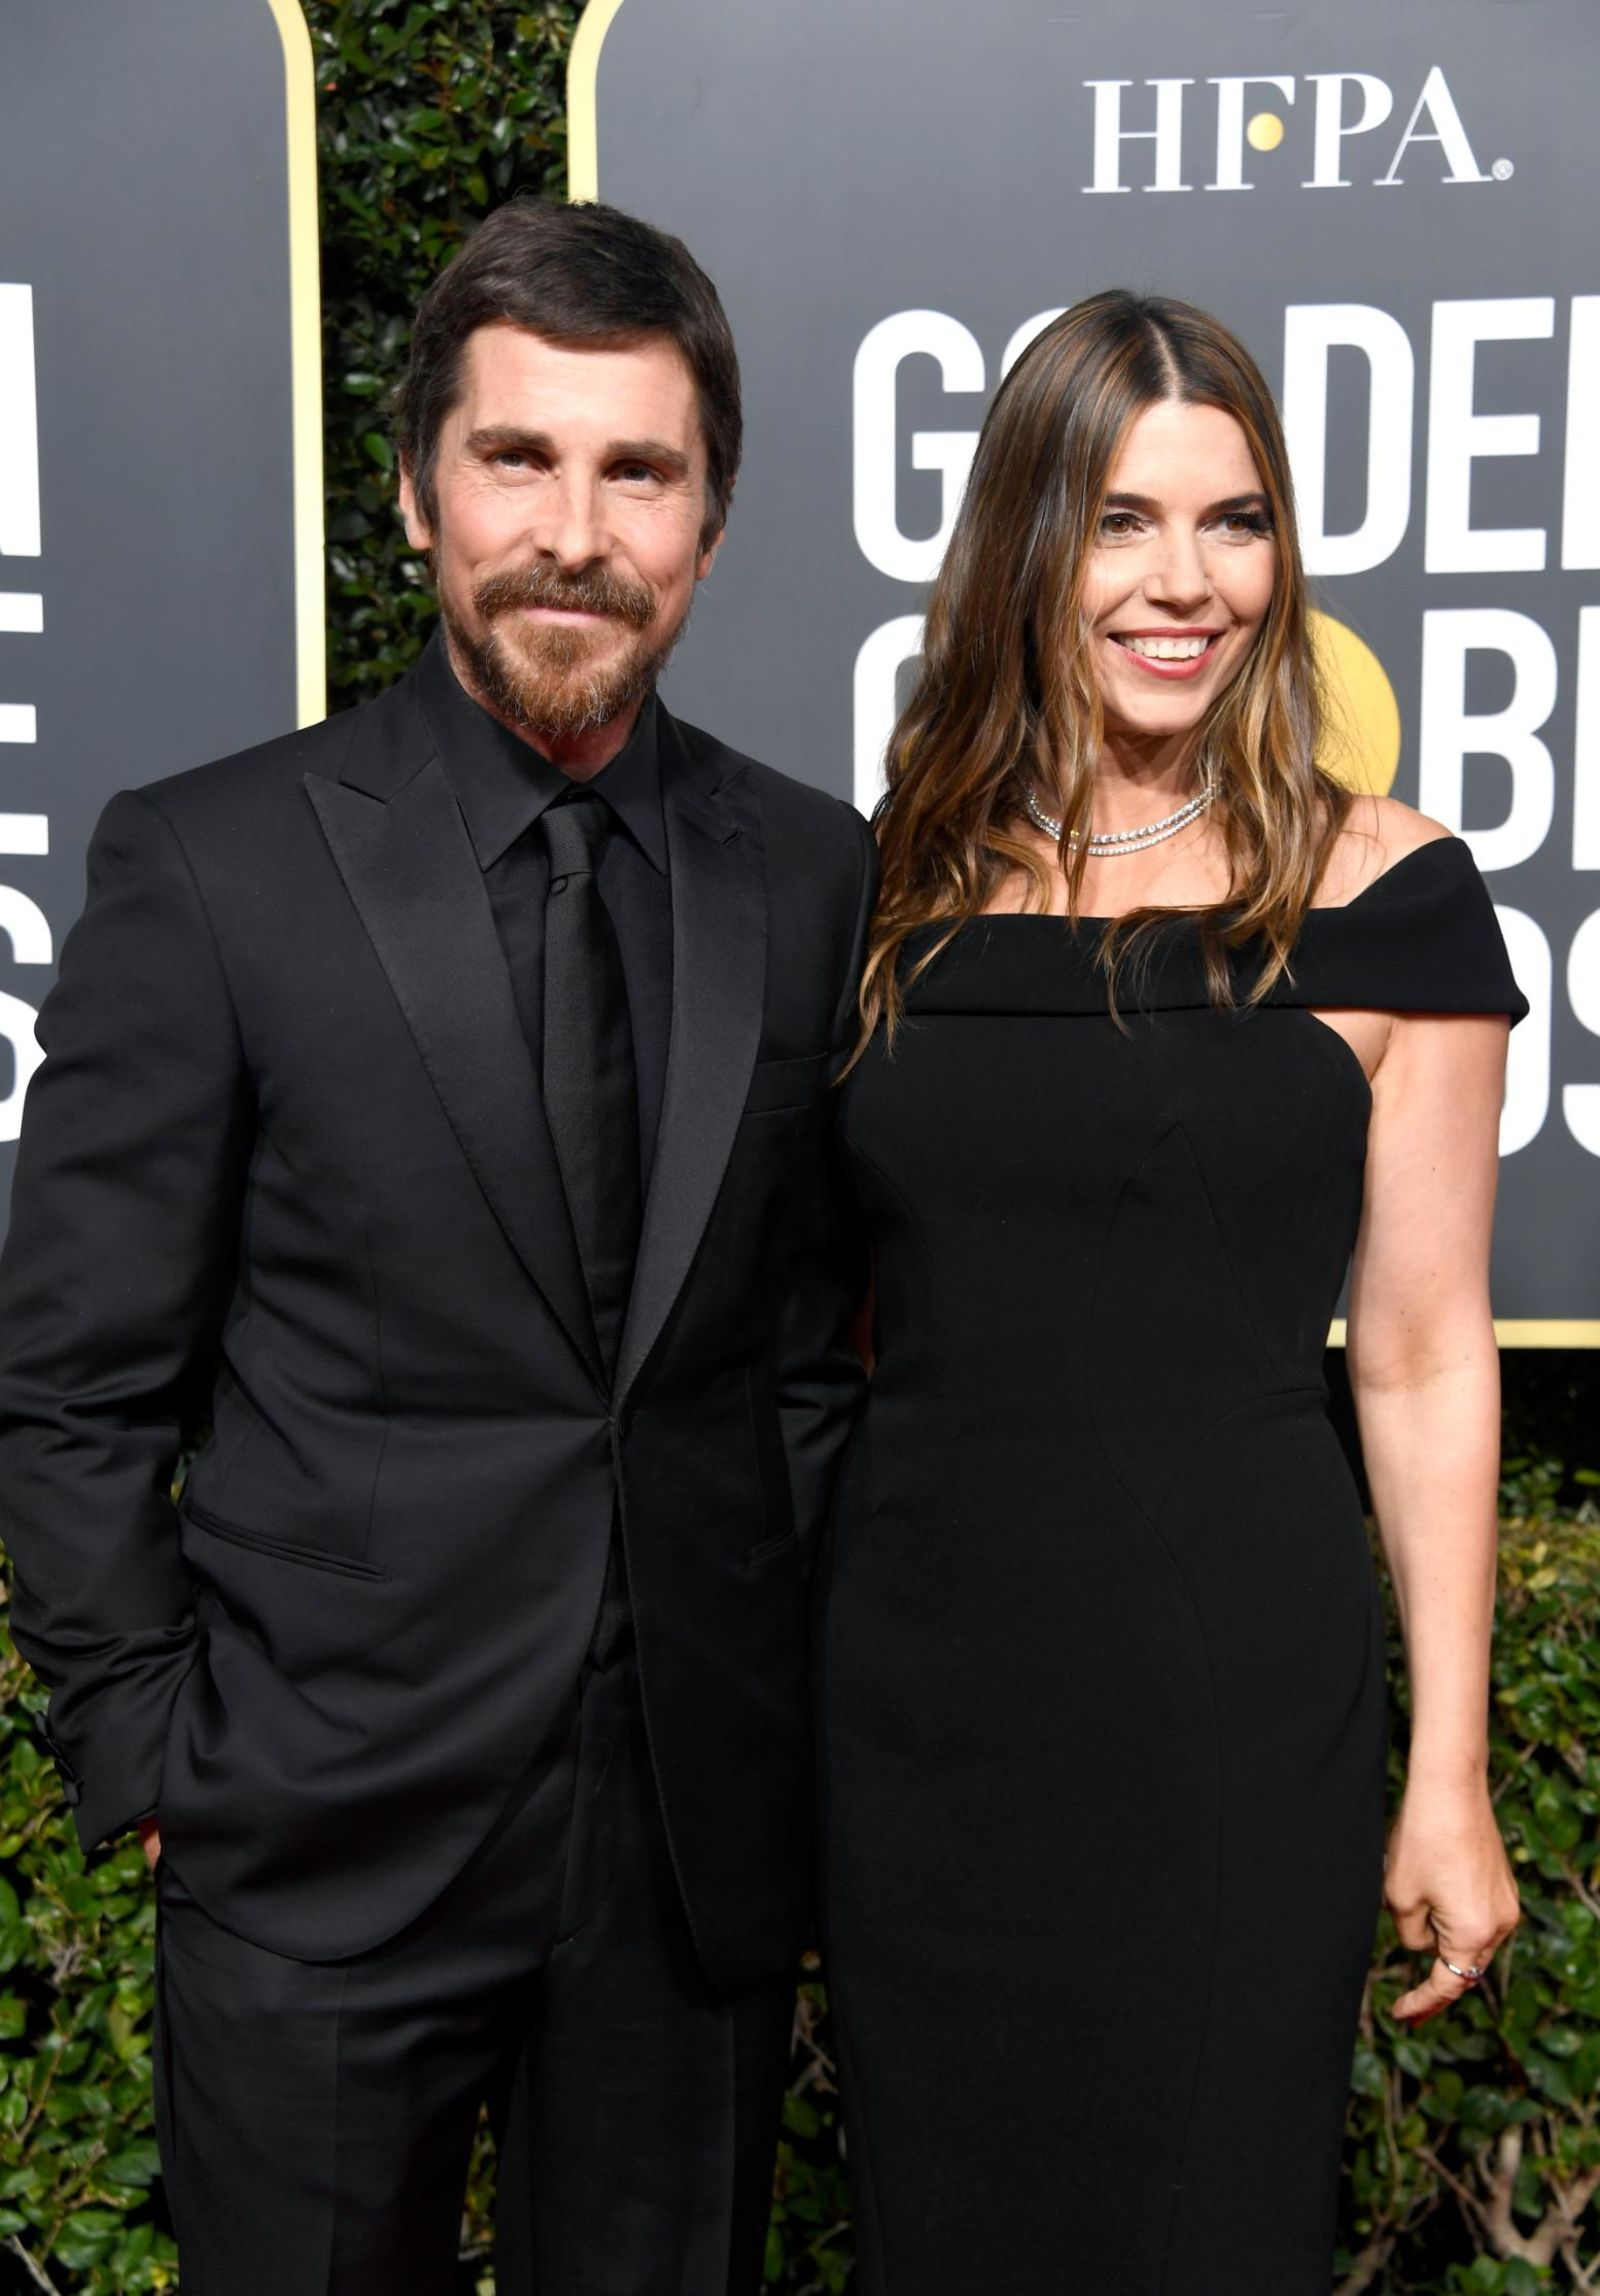 Christian Bale z żoną